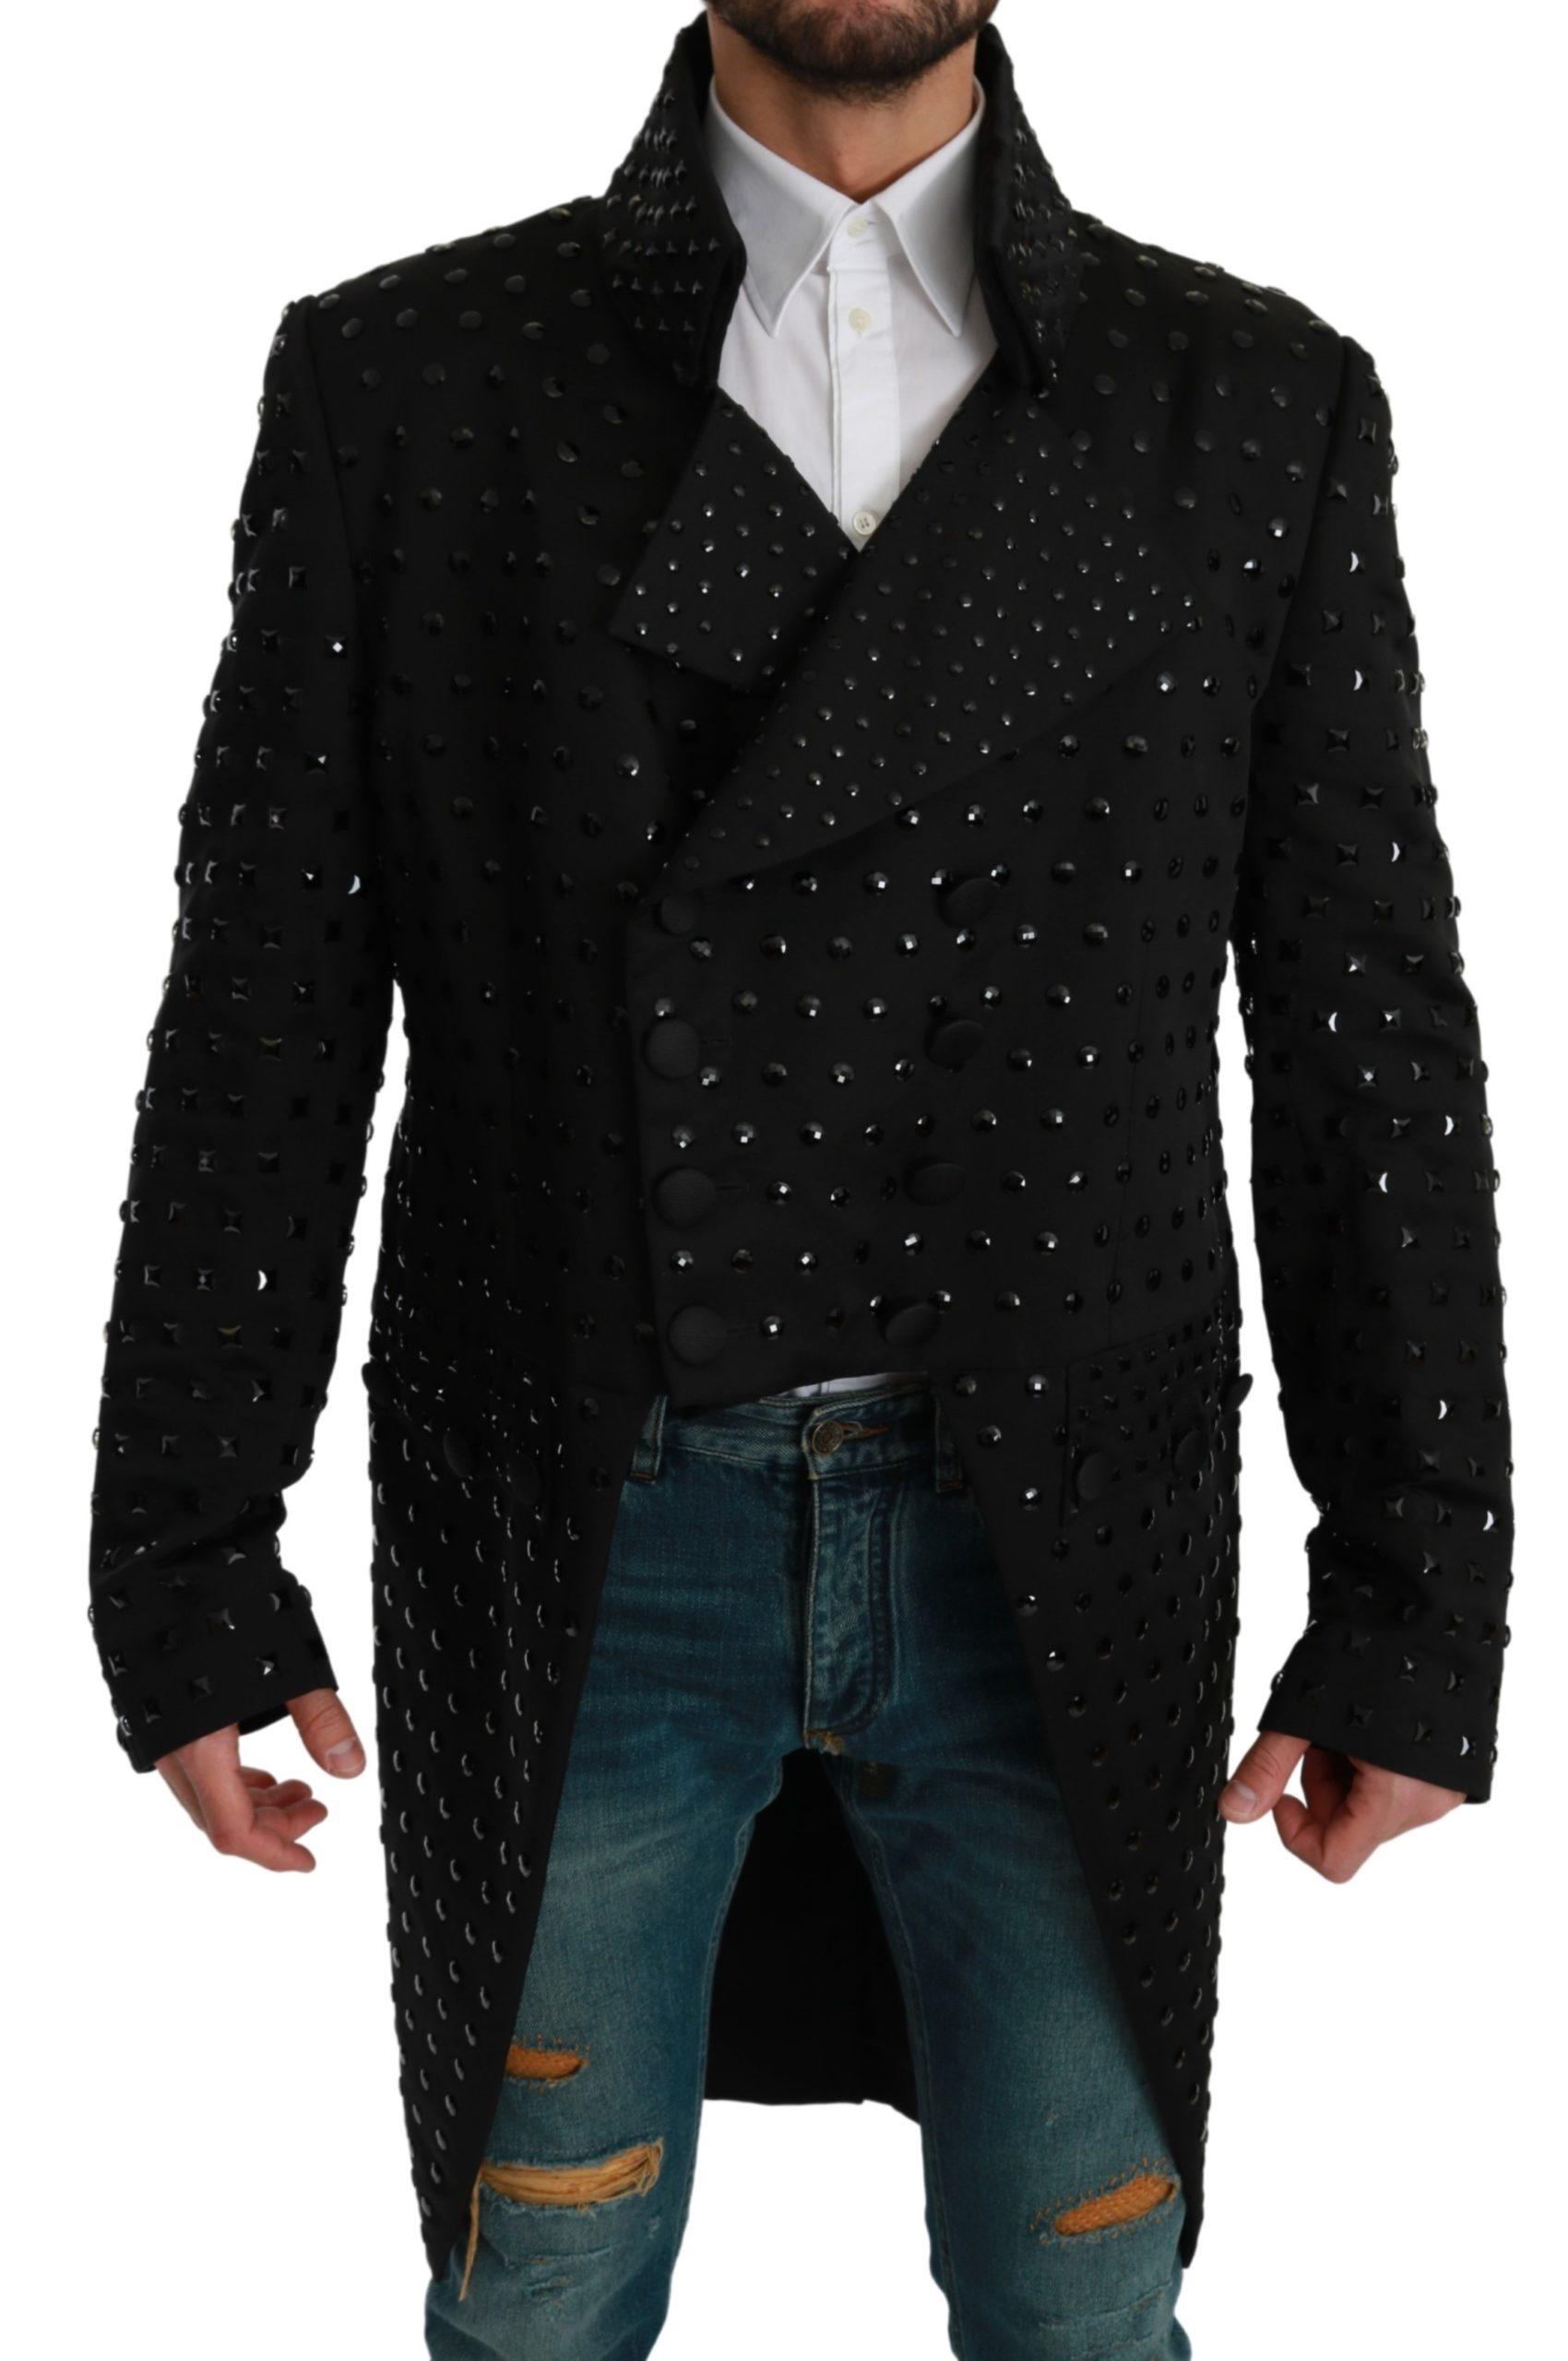 Dolce & Gabbana Men's Silk Crystal Blazer Black JKT2615 - IT58 | XXL